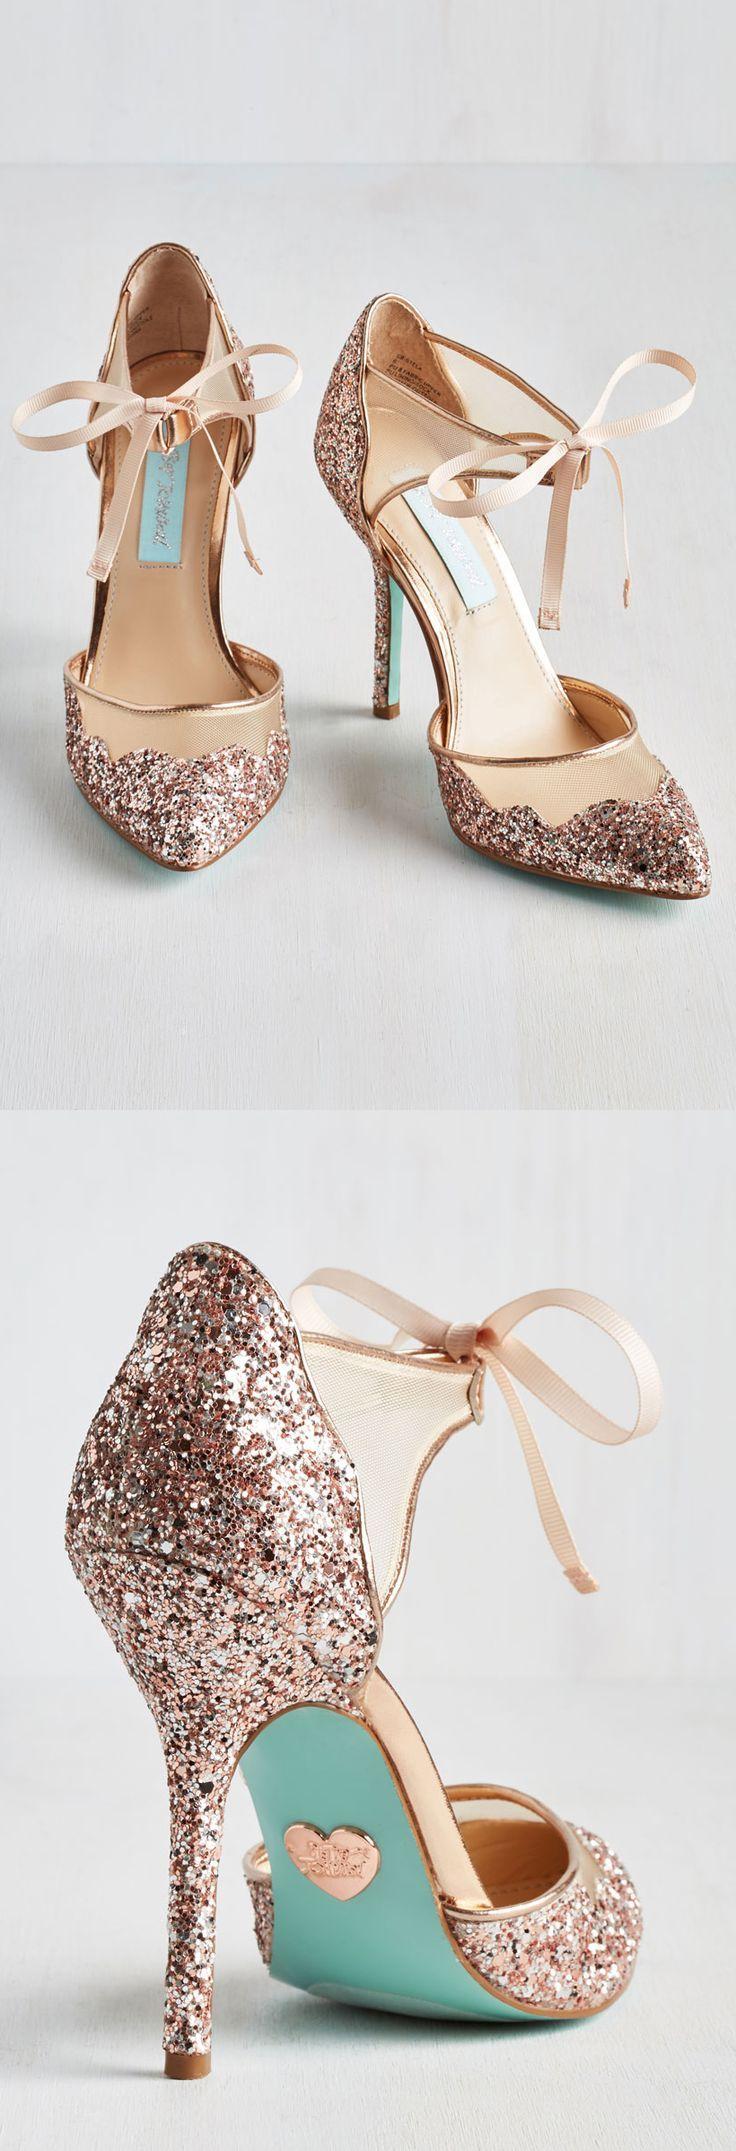 Black dress sandals for wedding - 15 Amazing Gift Ideas For Her Casual Wedding Dresseschiffon